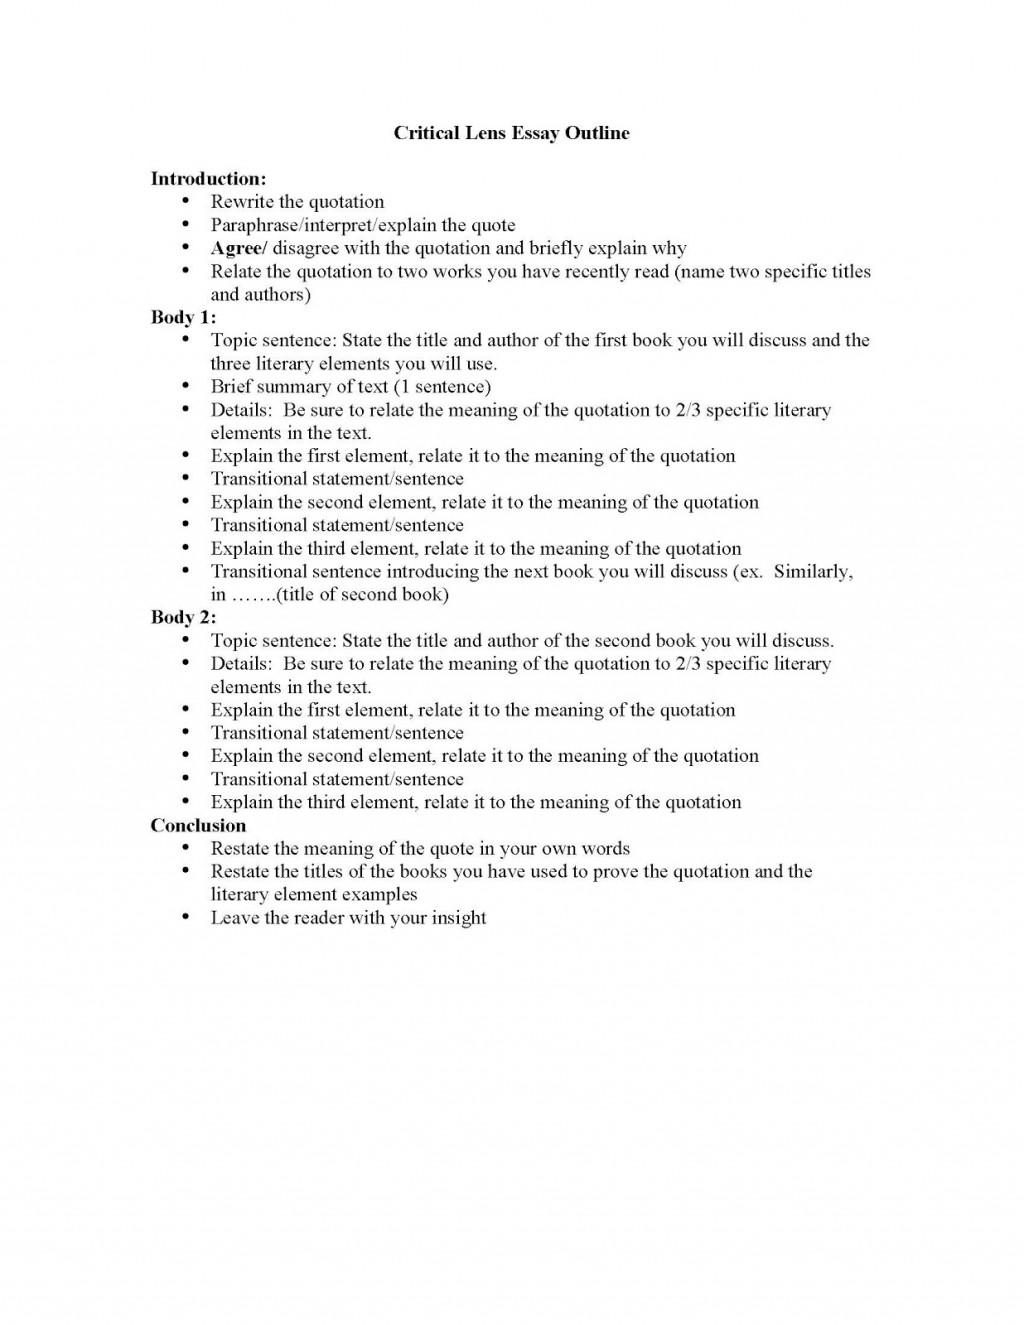 002 Essay Example Outline Of Criticallensessayoutlineandliterayelements Page 1 Impressive Argumentative Sample Mla Format Large